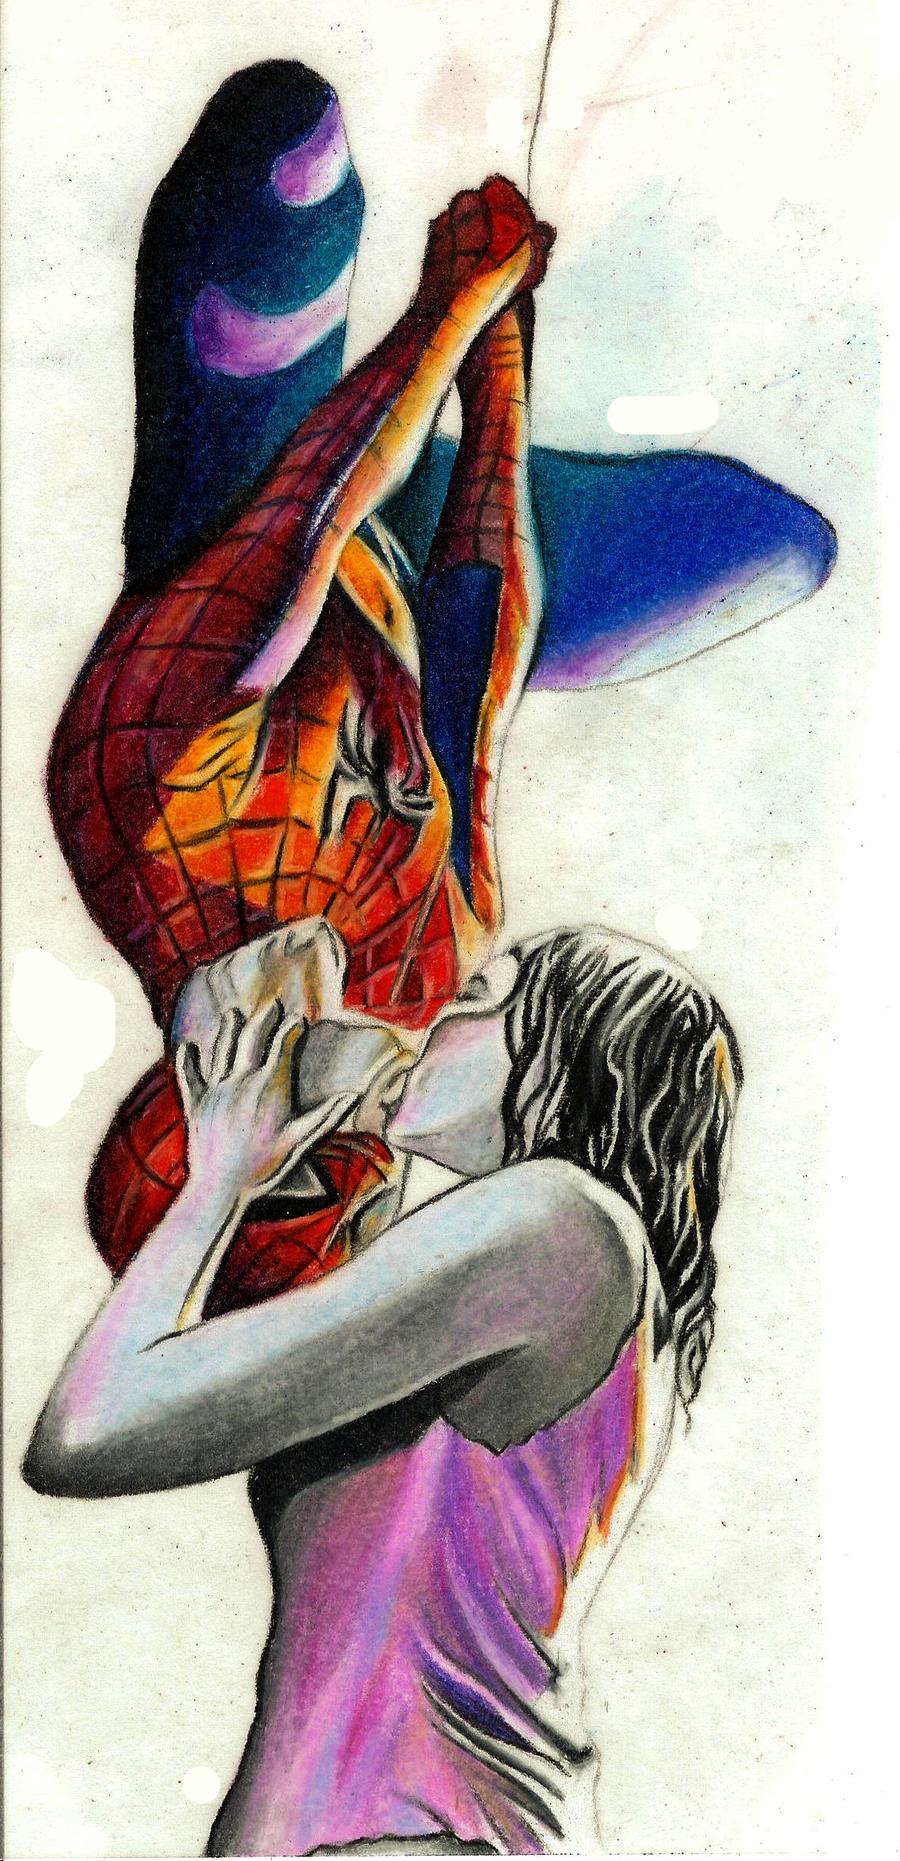 mary jane spiderman rain